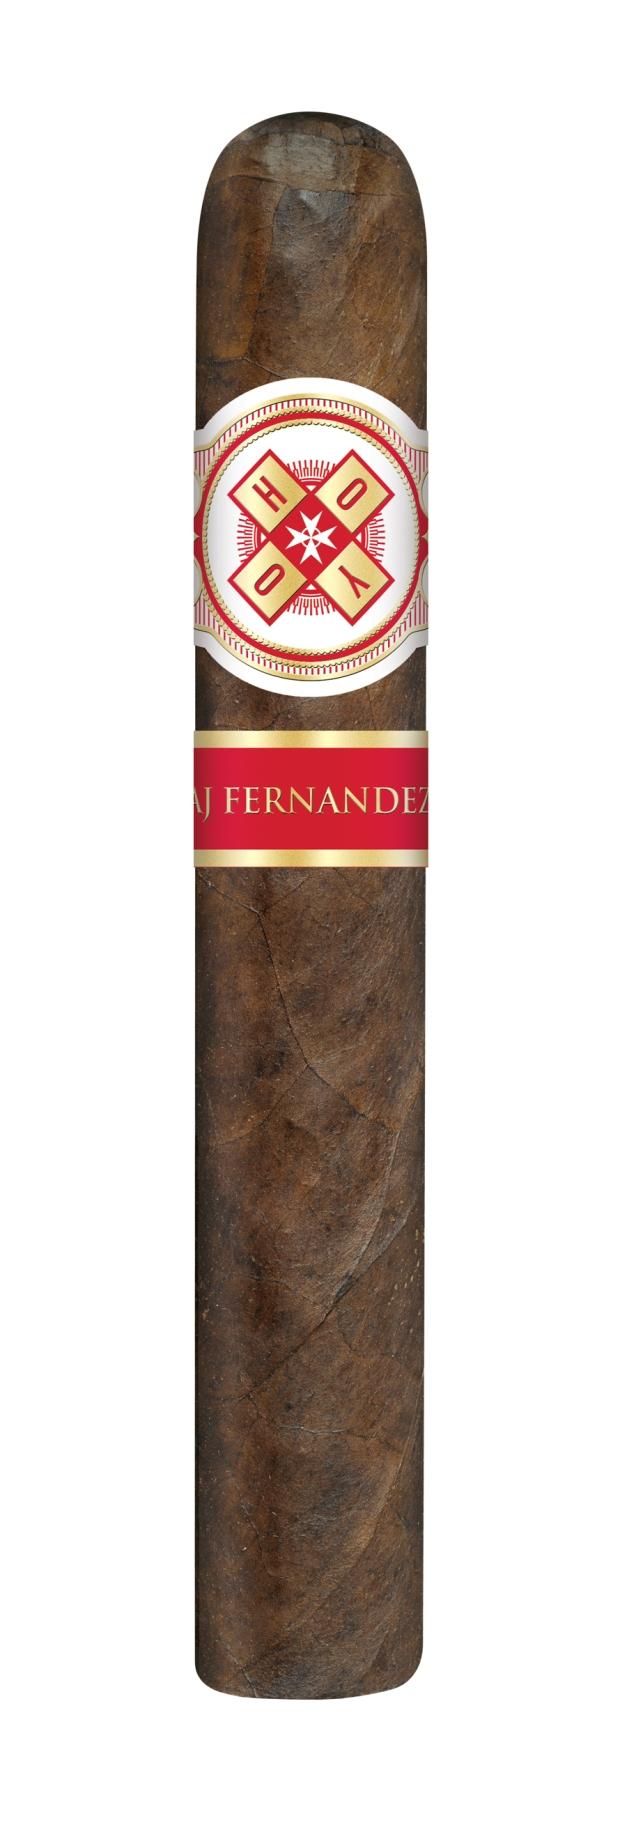 Hoyo_by_AJ_cigar